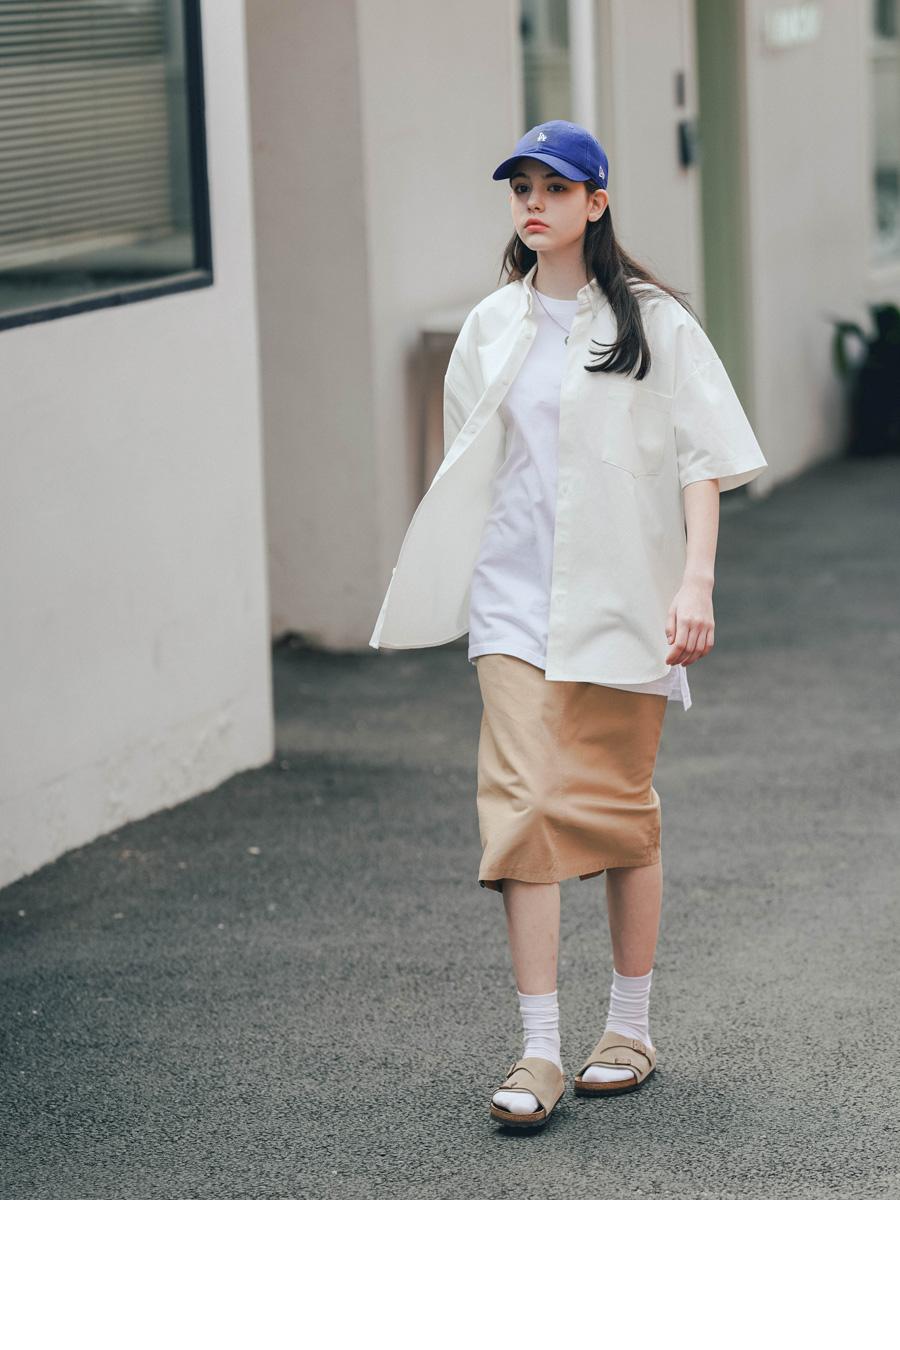 20210331_twn_bedy_shirt_model_je_05.jpg